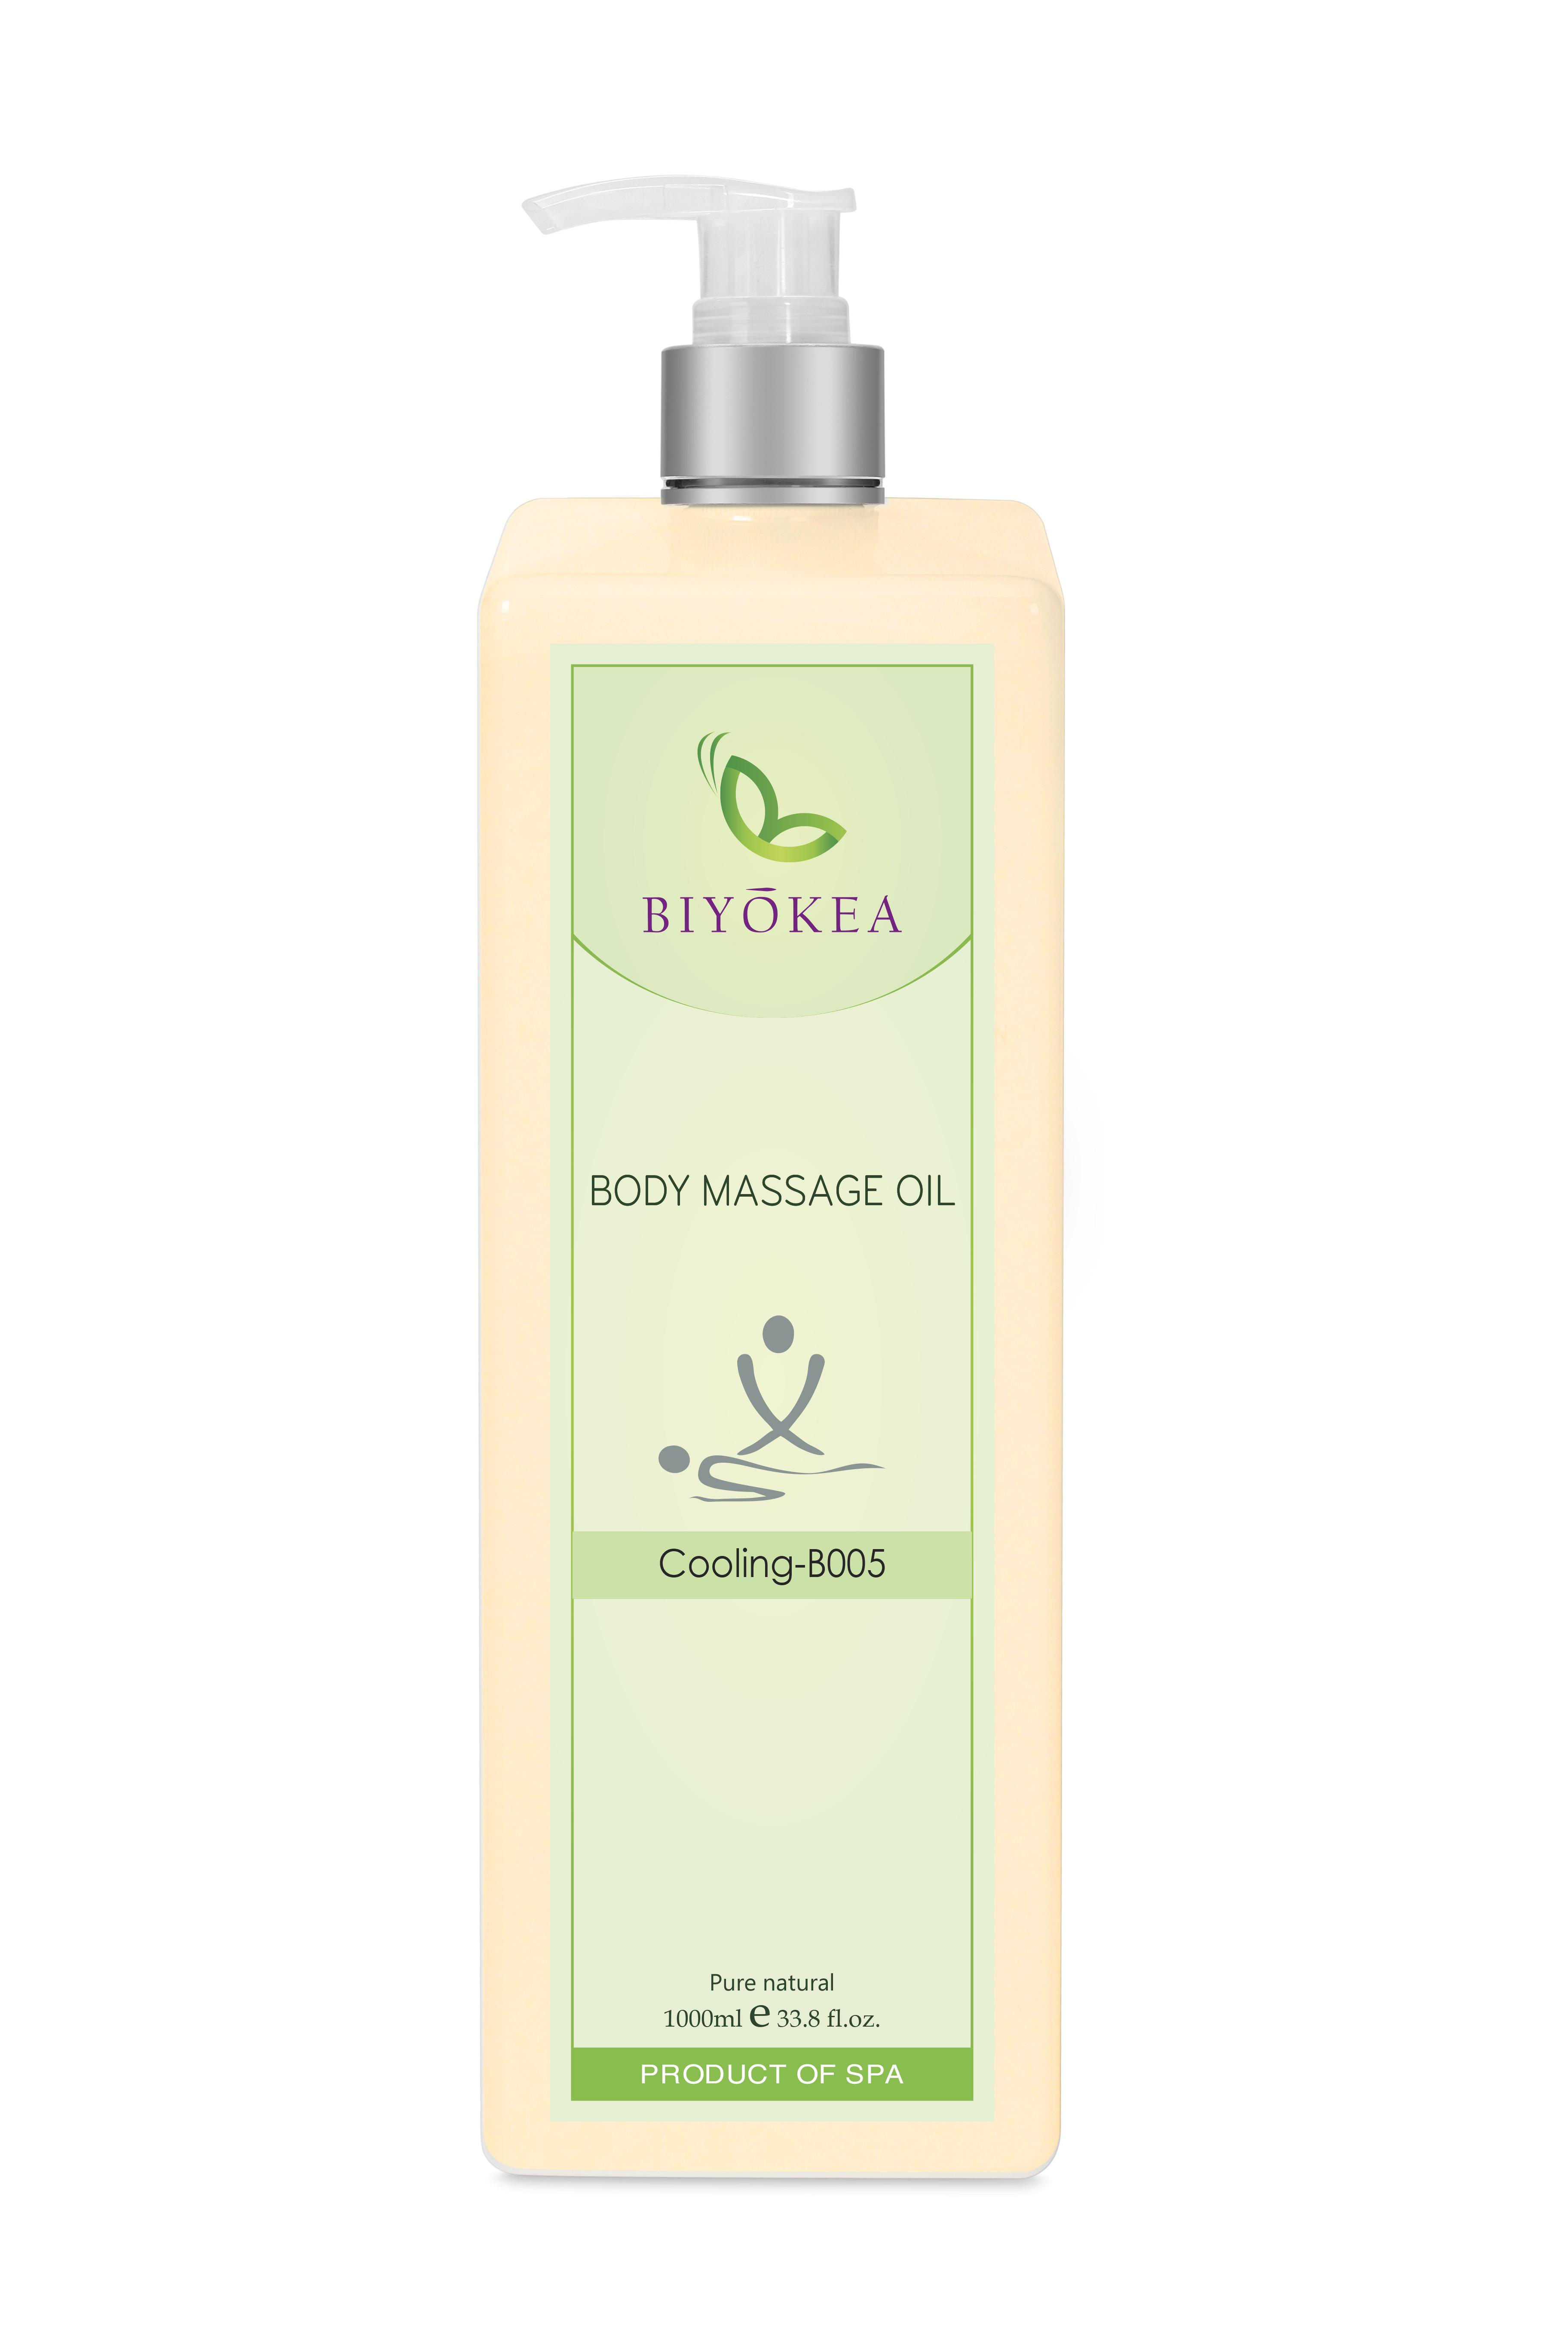 Dầu Massage Body Biyokea - Cooling B005 (Làm mát) - 1000ml